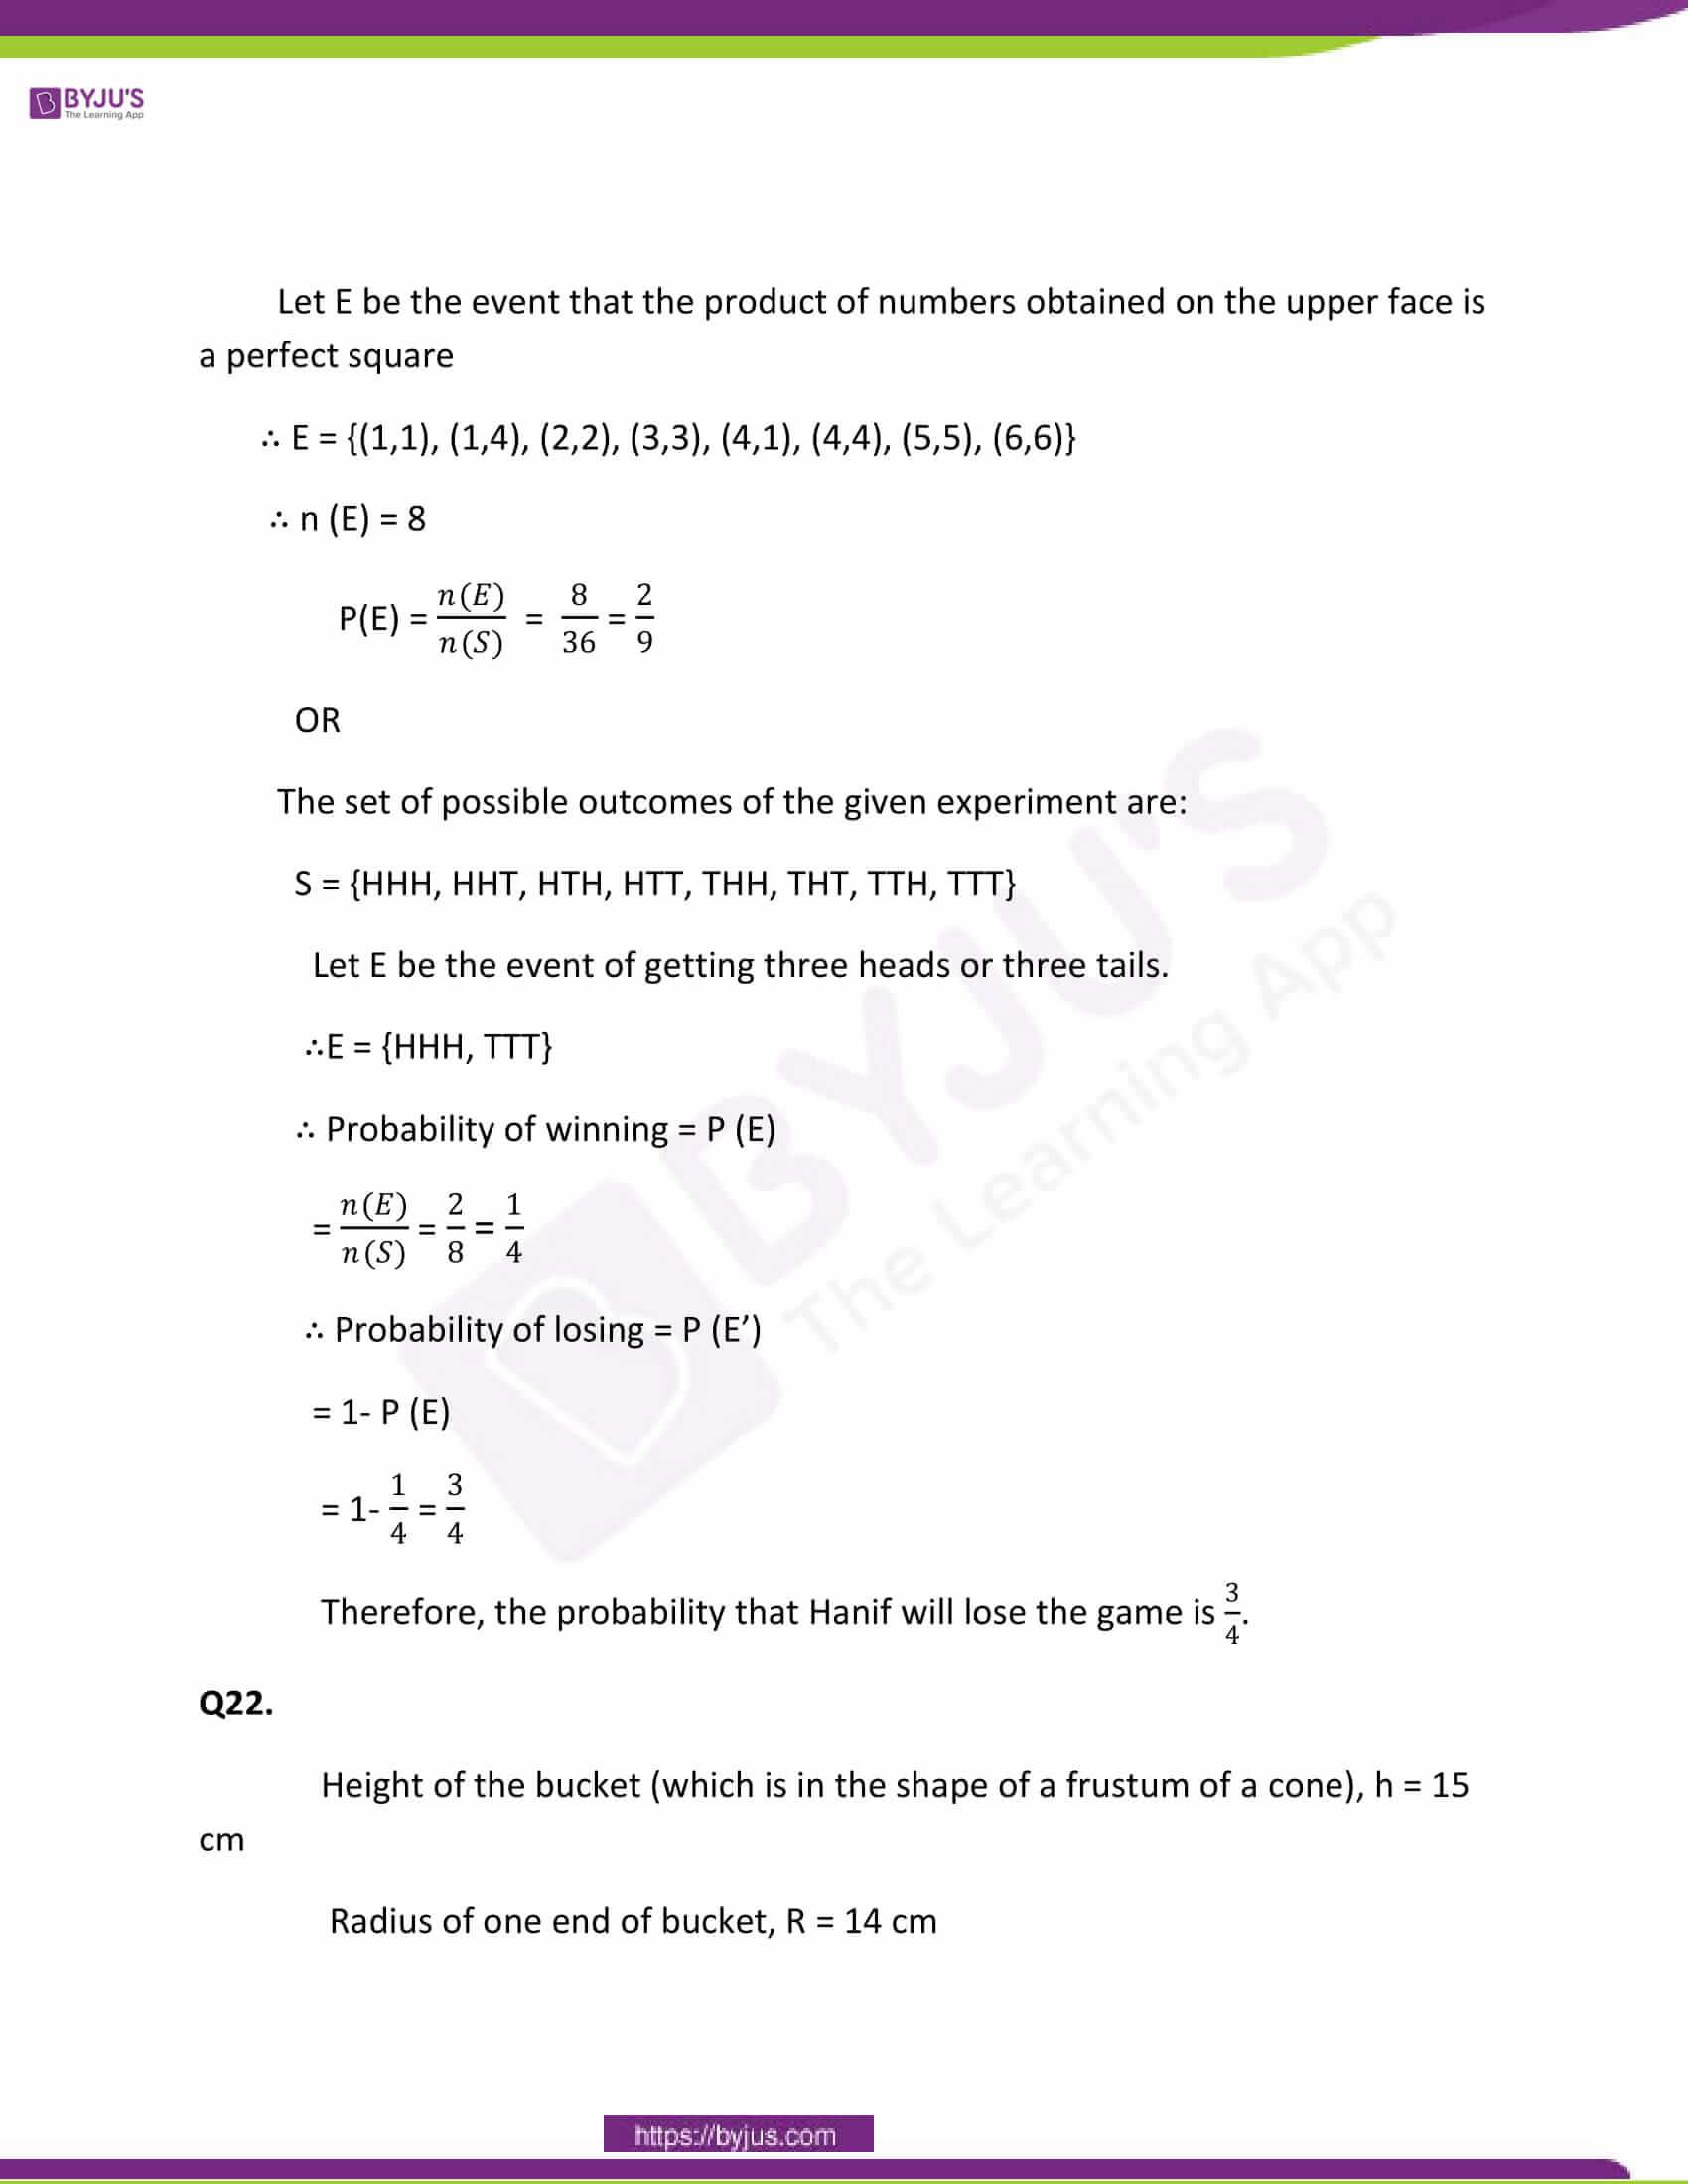 CBSE Class 10 Maths Papers Solution 2011 15